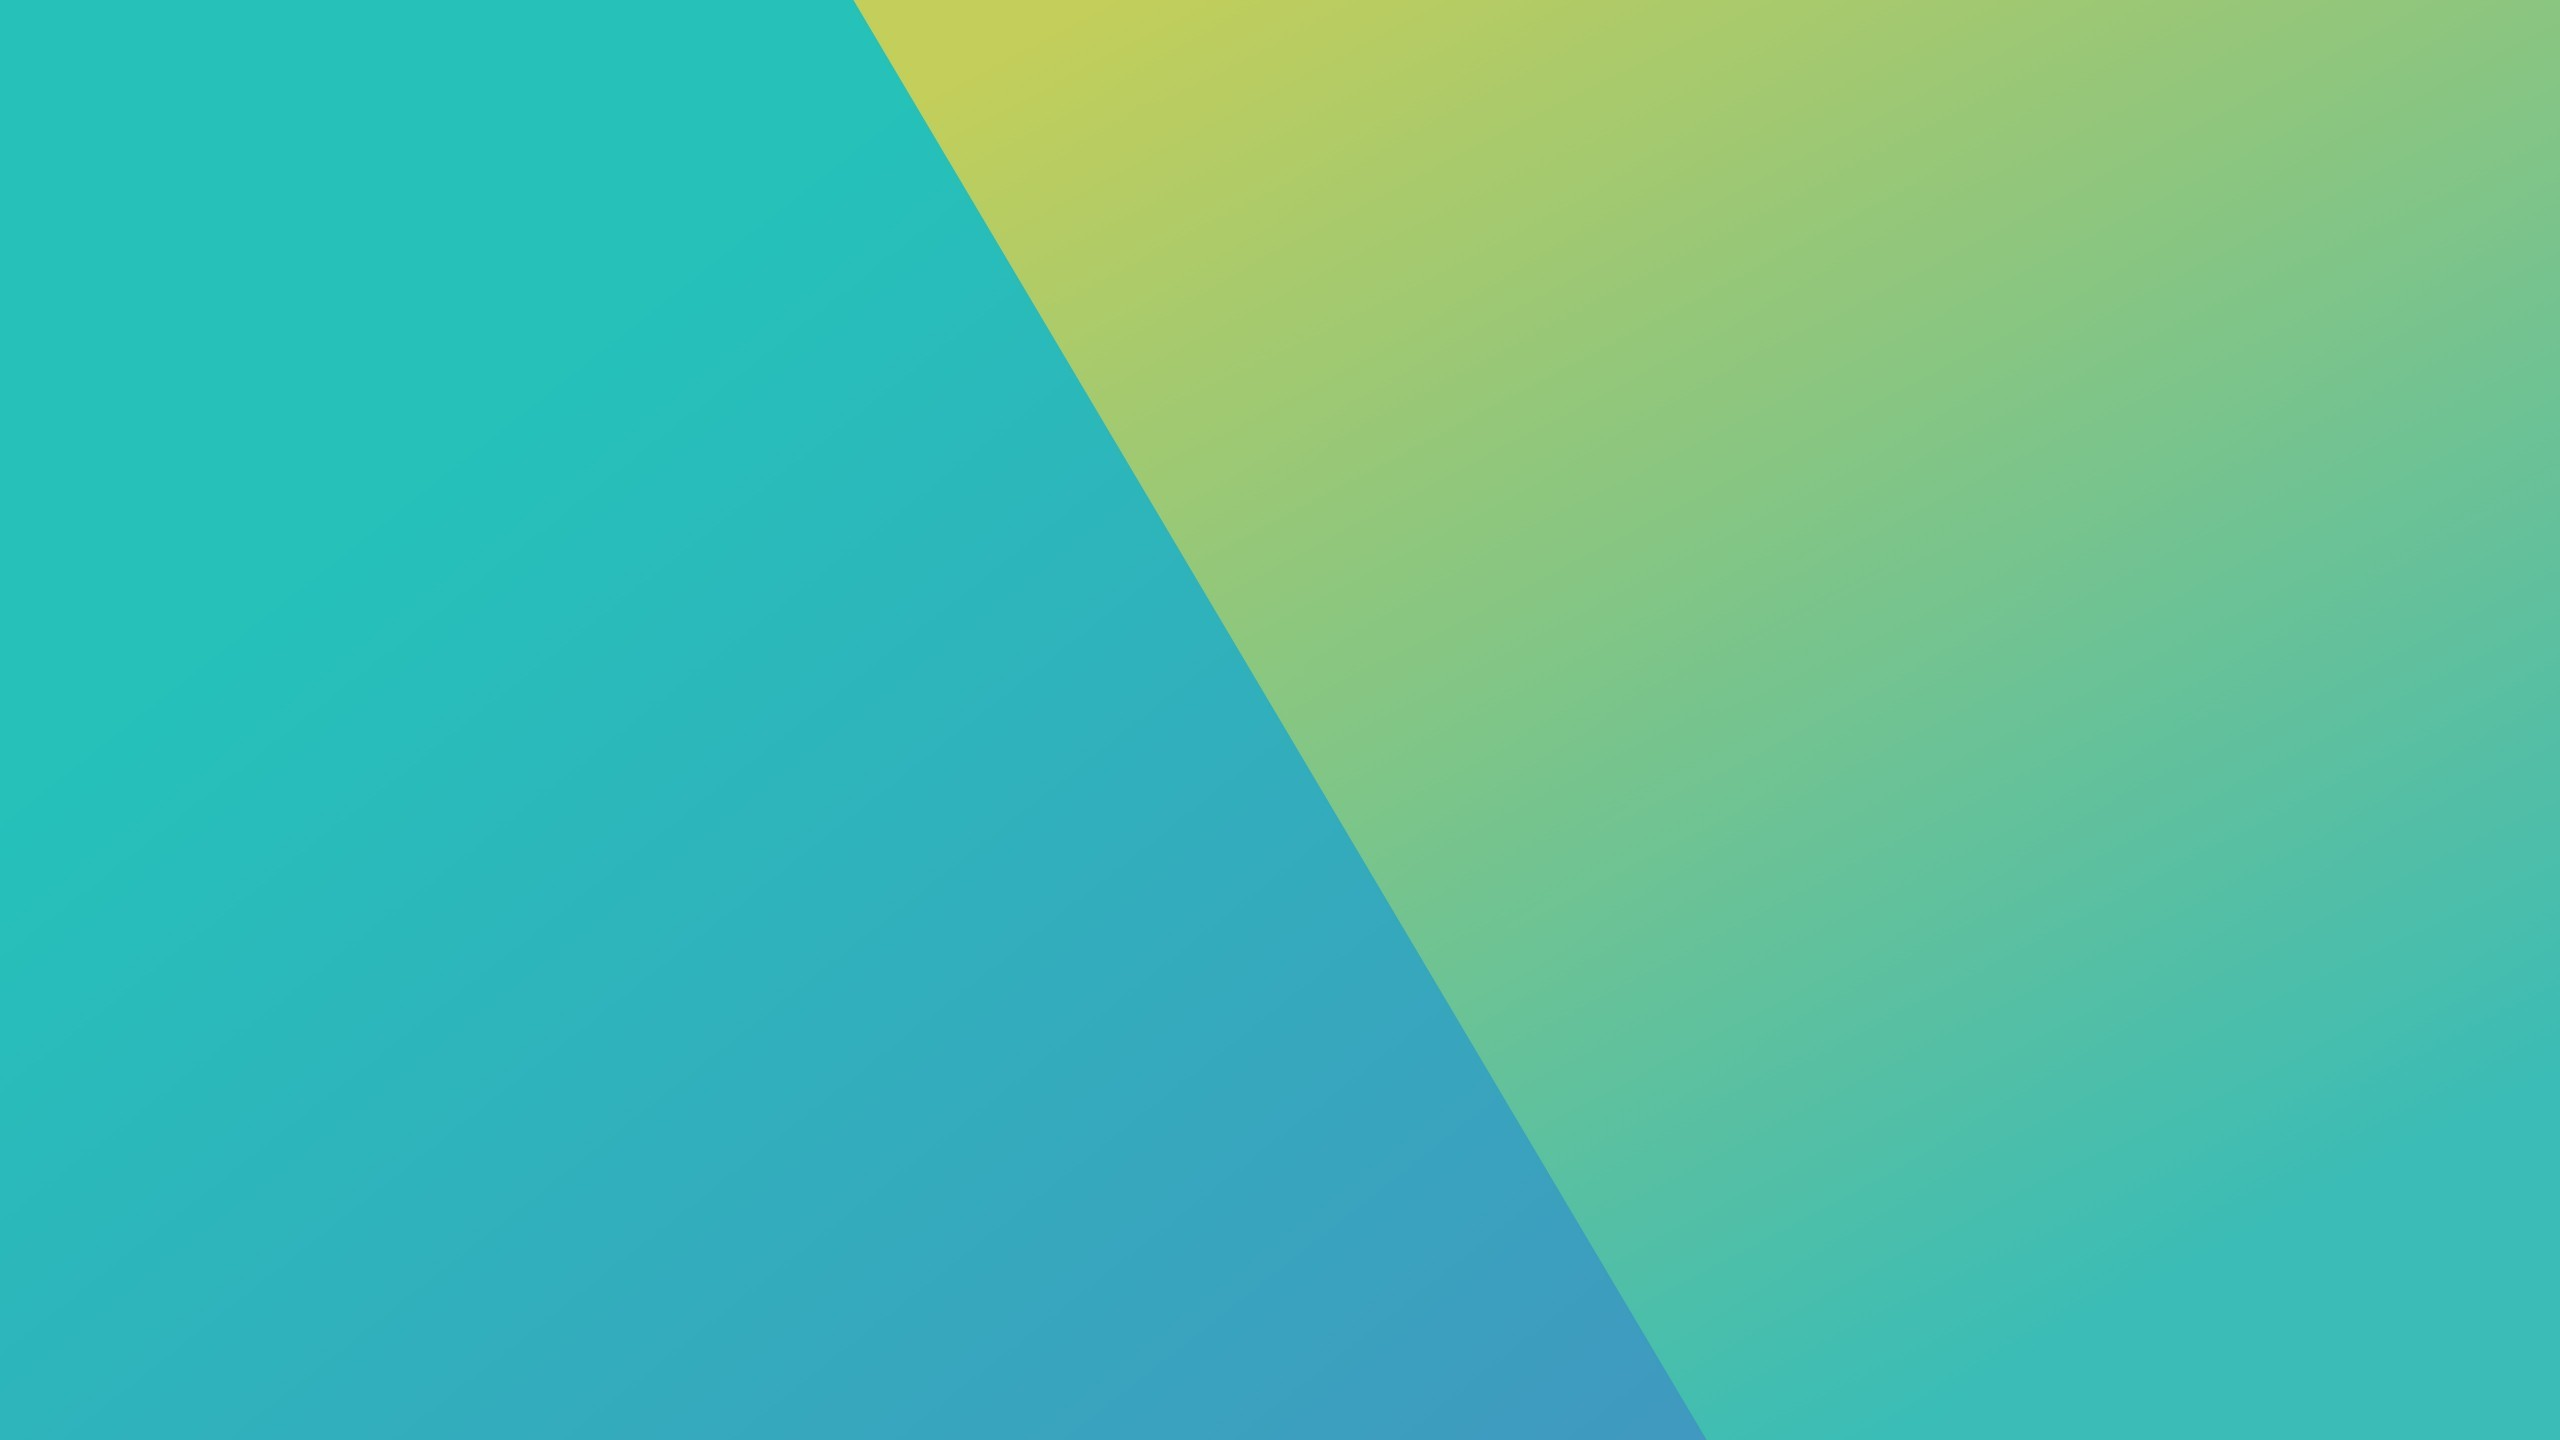 Res: 2560x1440, Minimal / Gradients Wallpaper